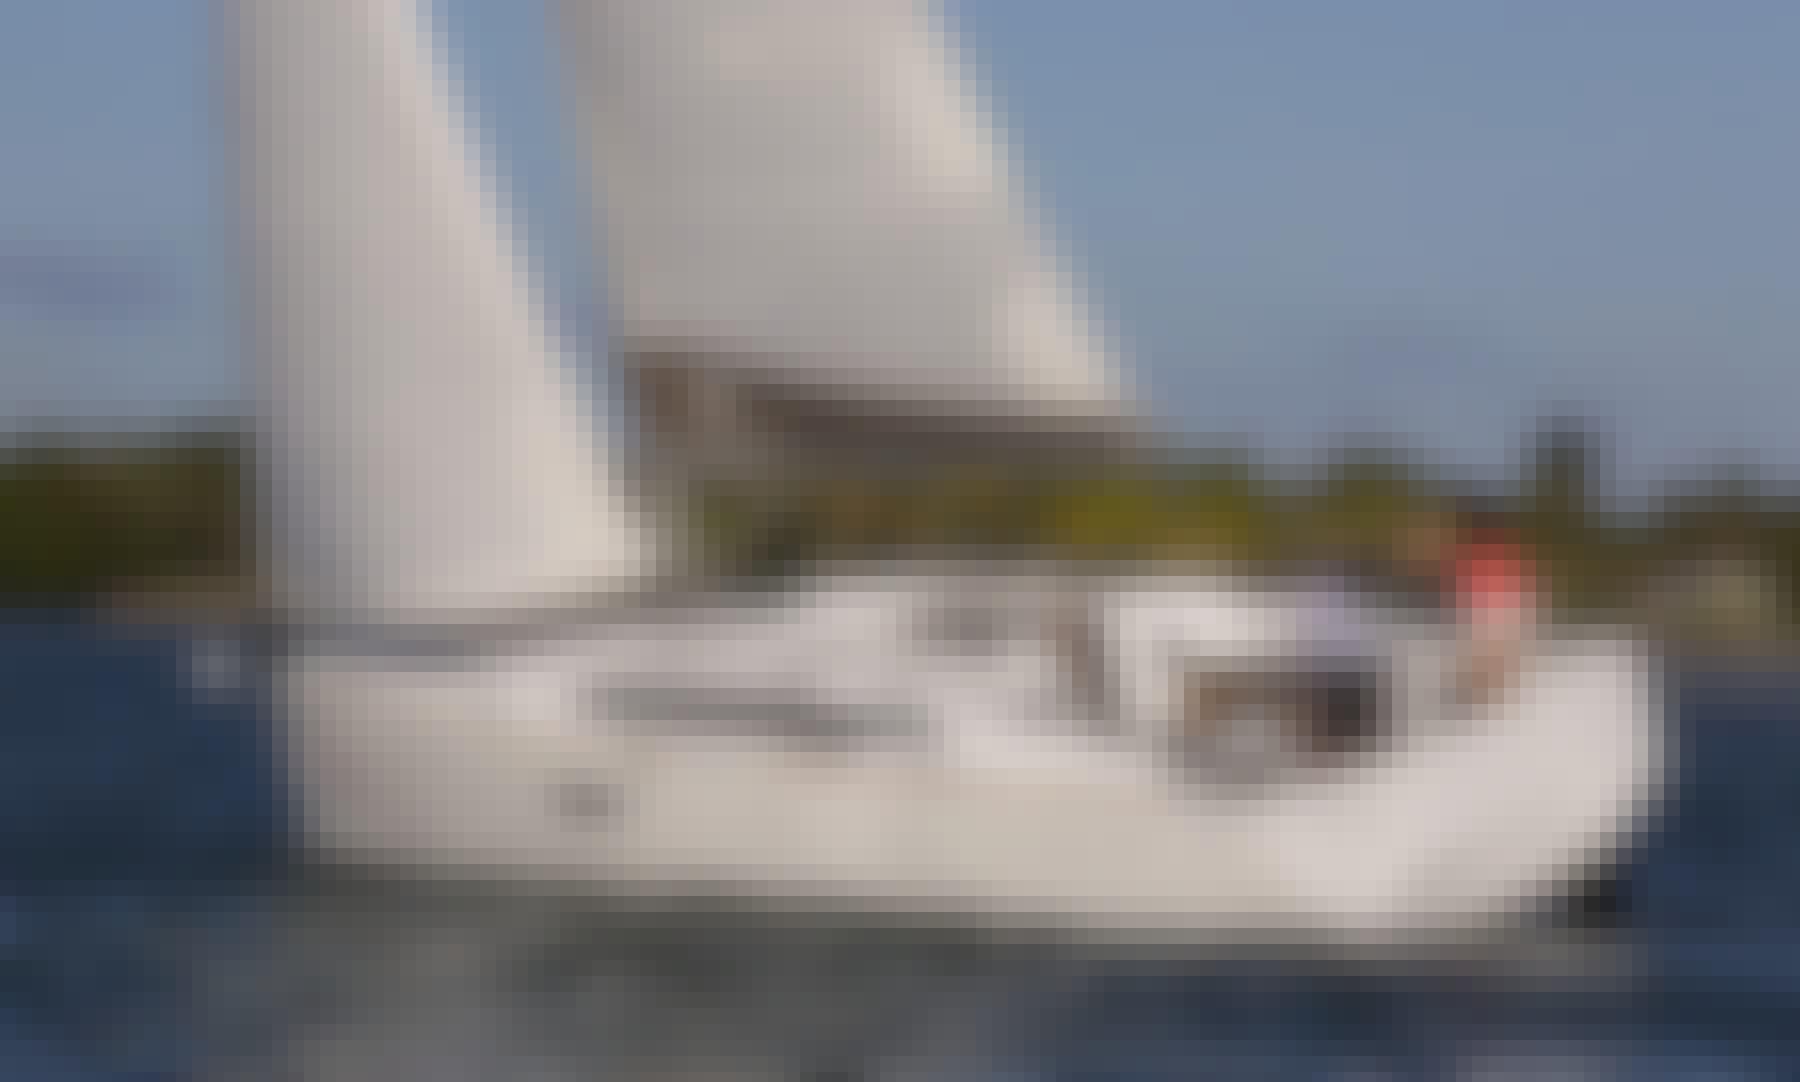 2021 Jeanneau Sun Odyssey 349 Sailing Yacht Charter in Arona, Canarias